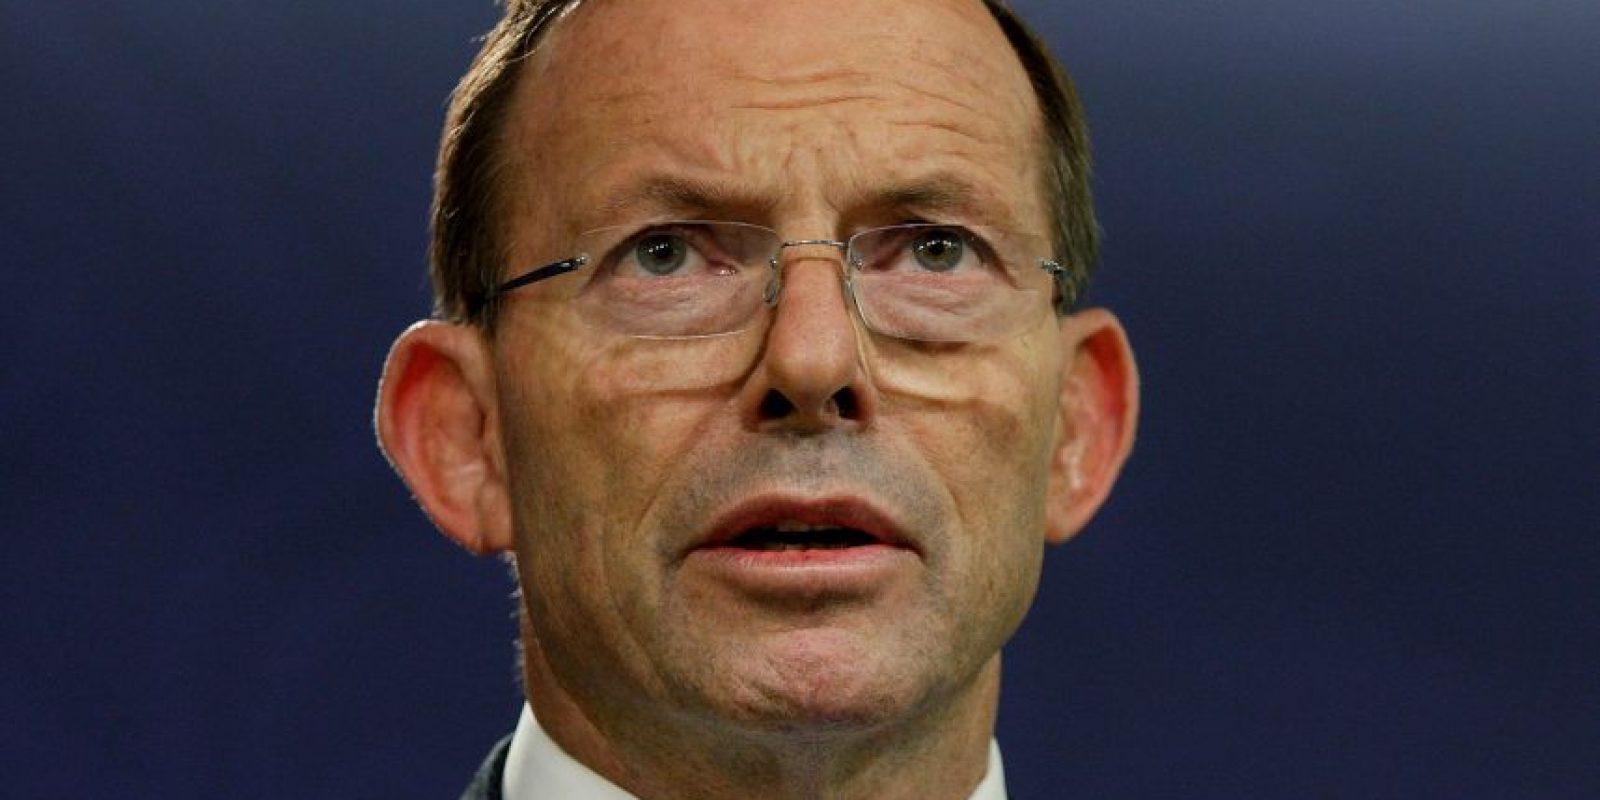 Tony Abbott, le dijo a la madre del niño que posó con una cabeza decapitada, que si regresa a Australia será castigada severamente. Foto:Getty Images